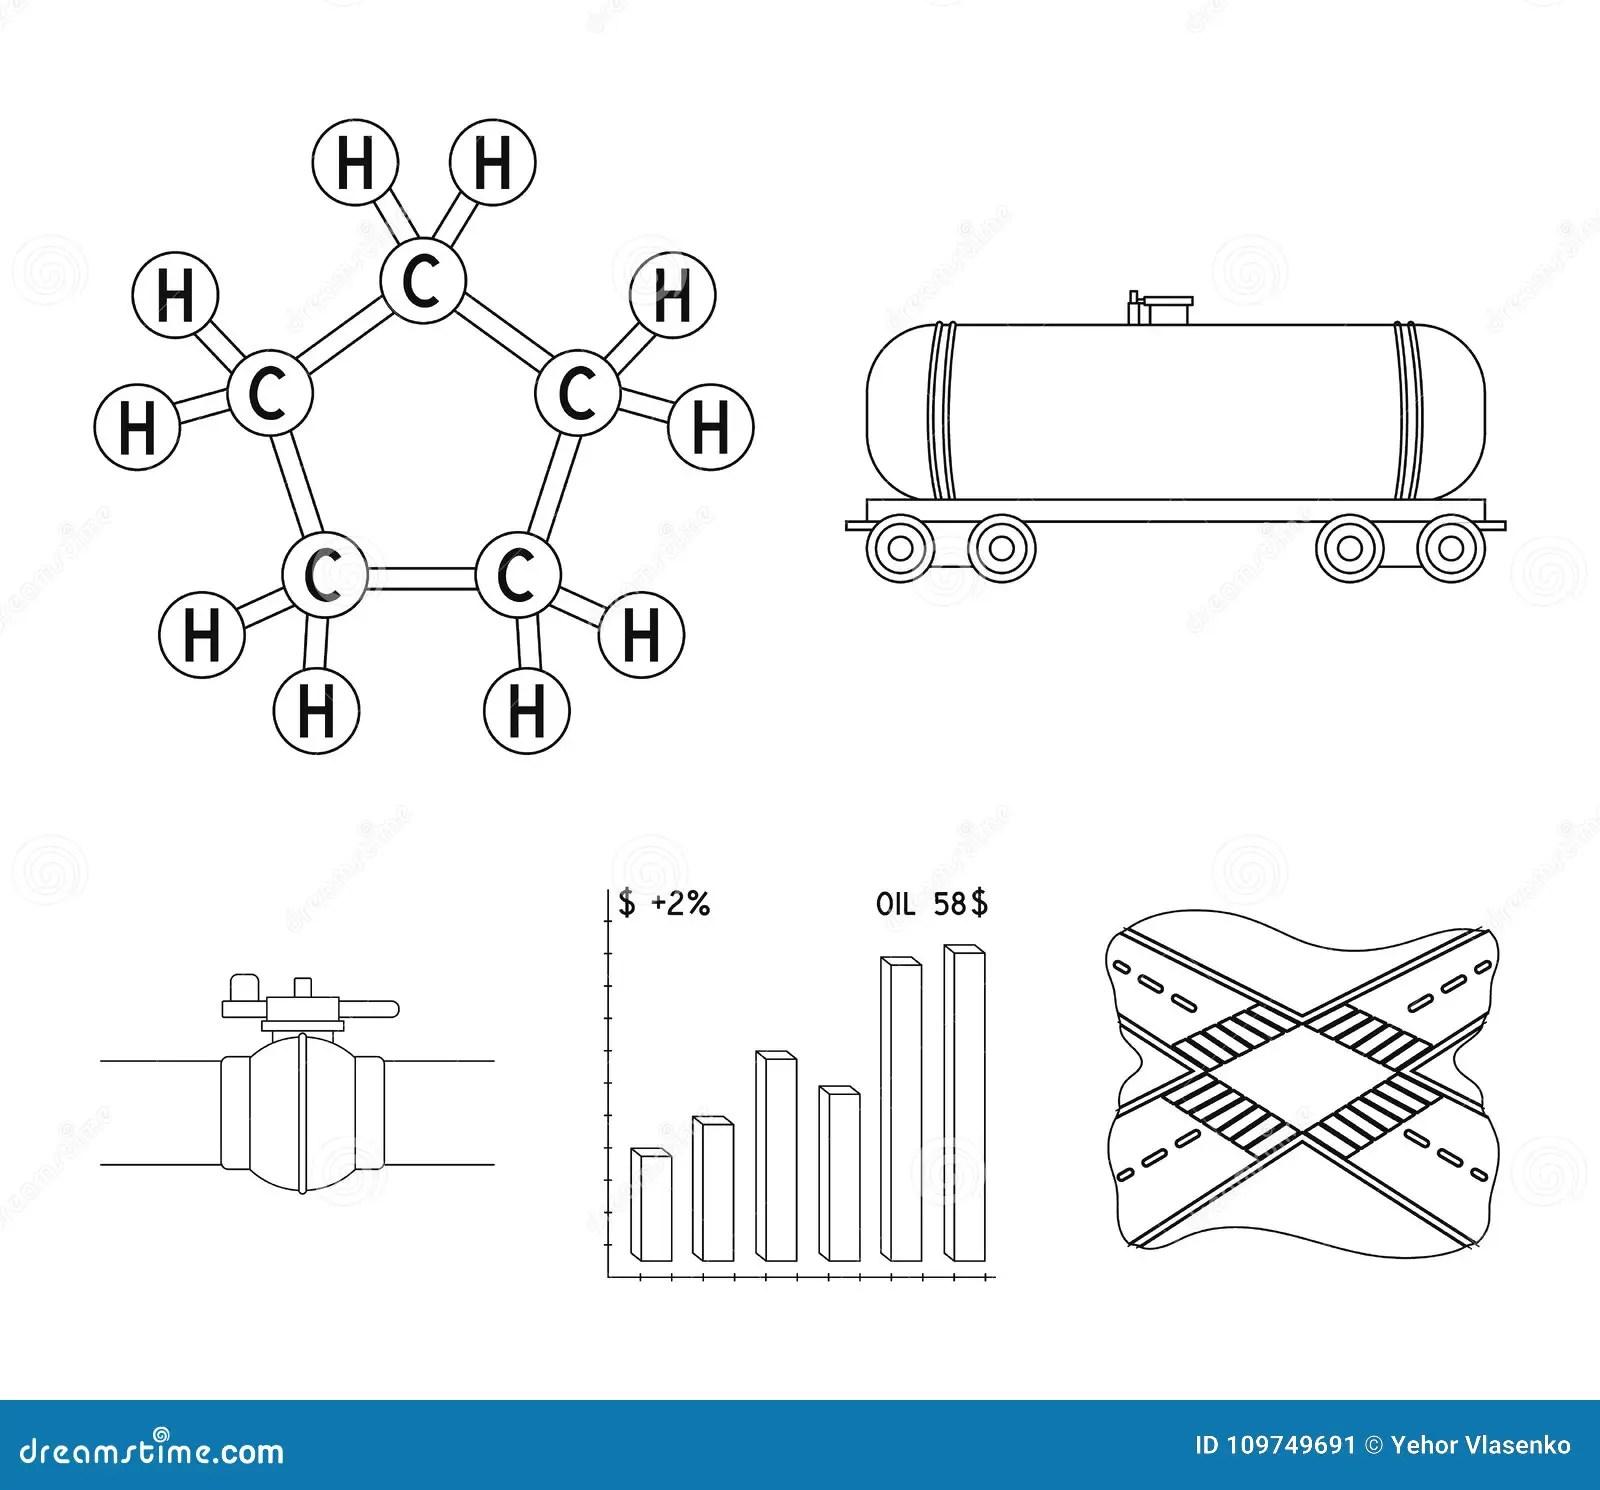 Railway Tank, Chemical Formula, Oil Price Chart, Pipeline